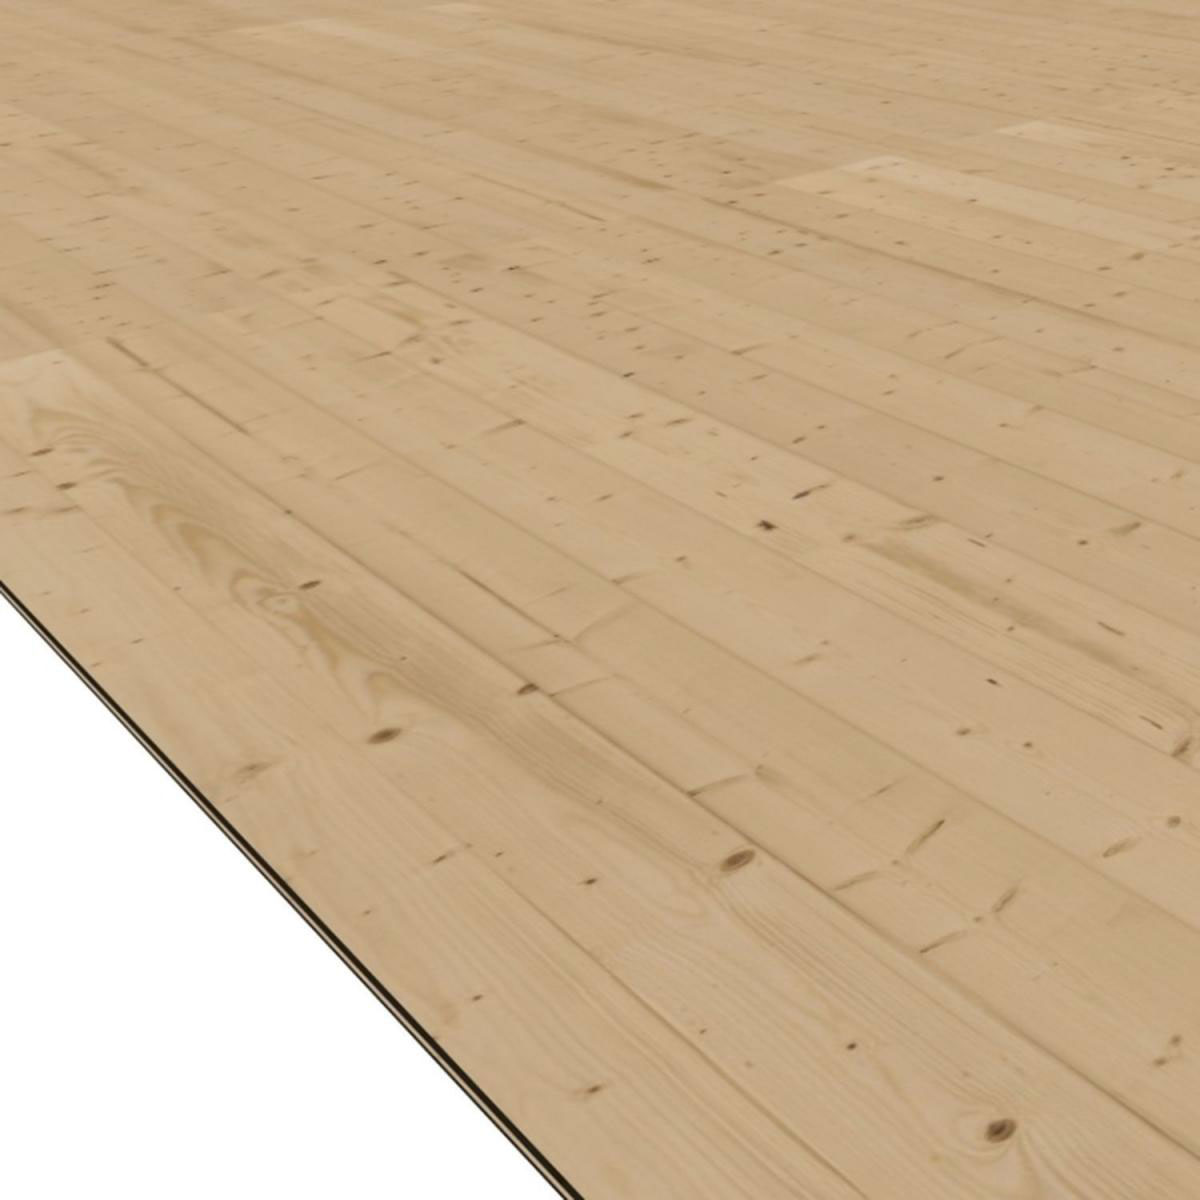 Karibu Fußboden für Gartenhäuser (BxT: 181 x 442 cm)